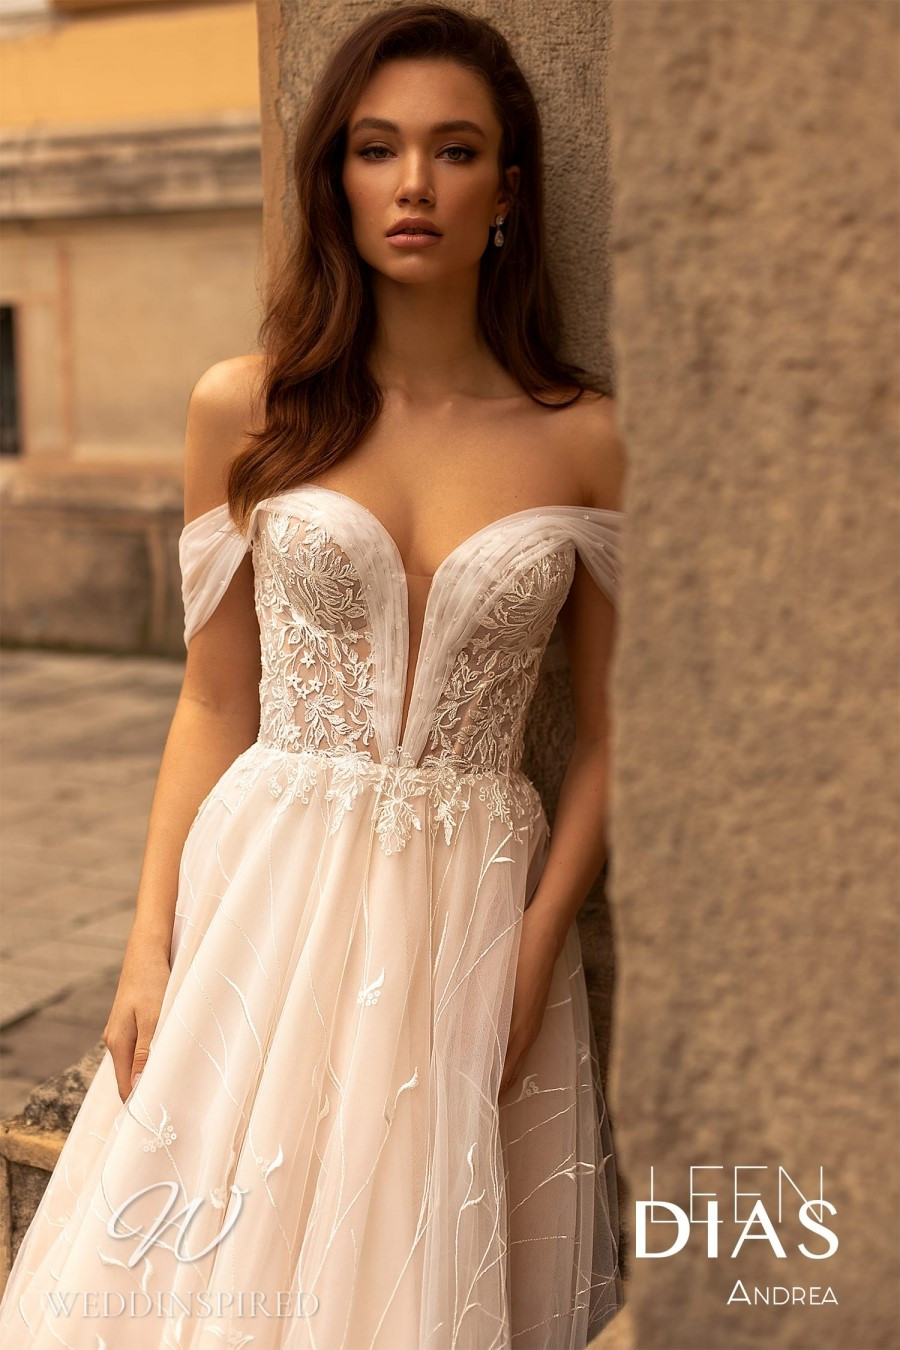 A Leen Dias 2021 tulle off the shoulder A-line wedding dress